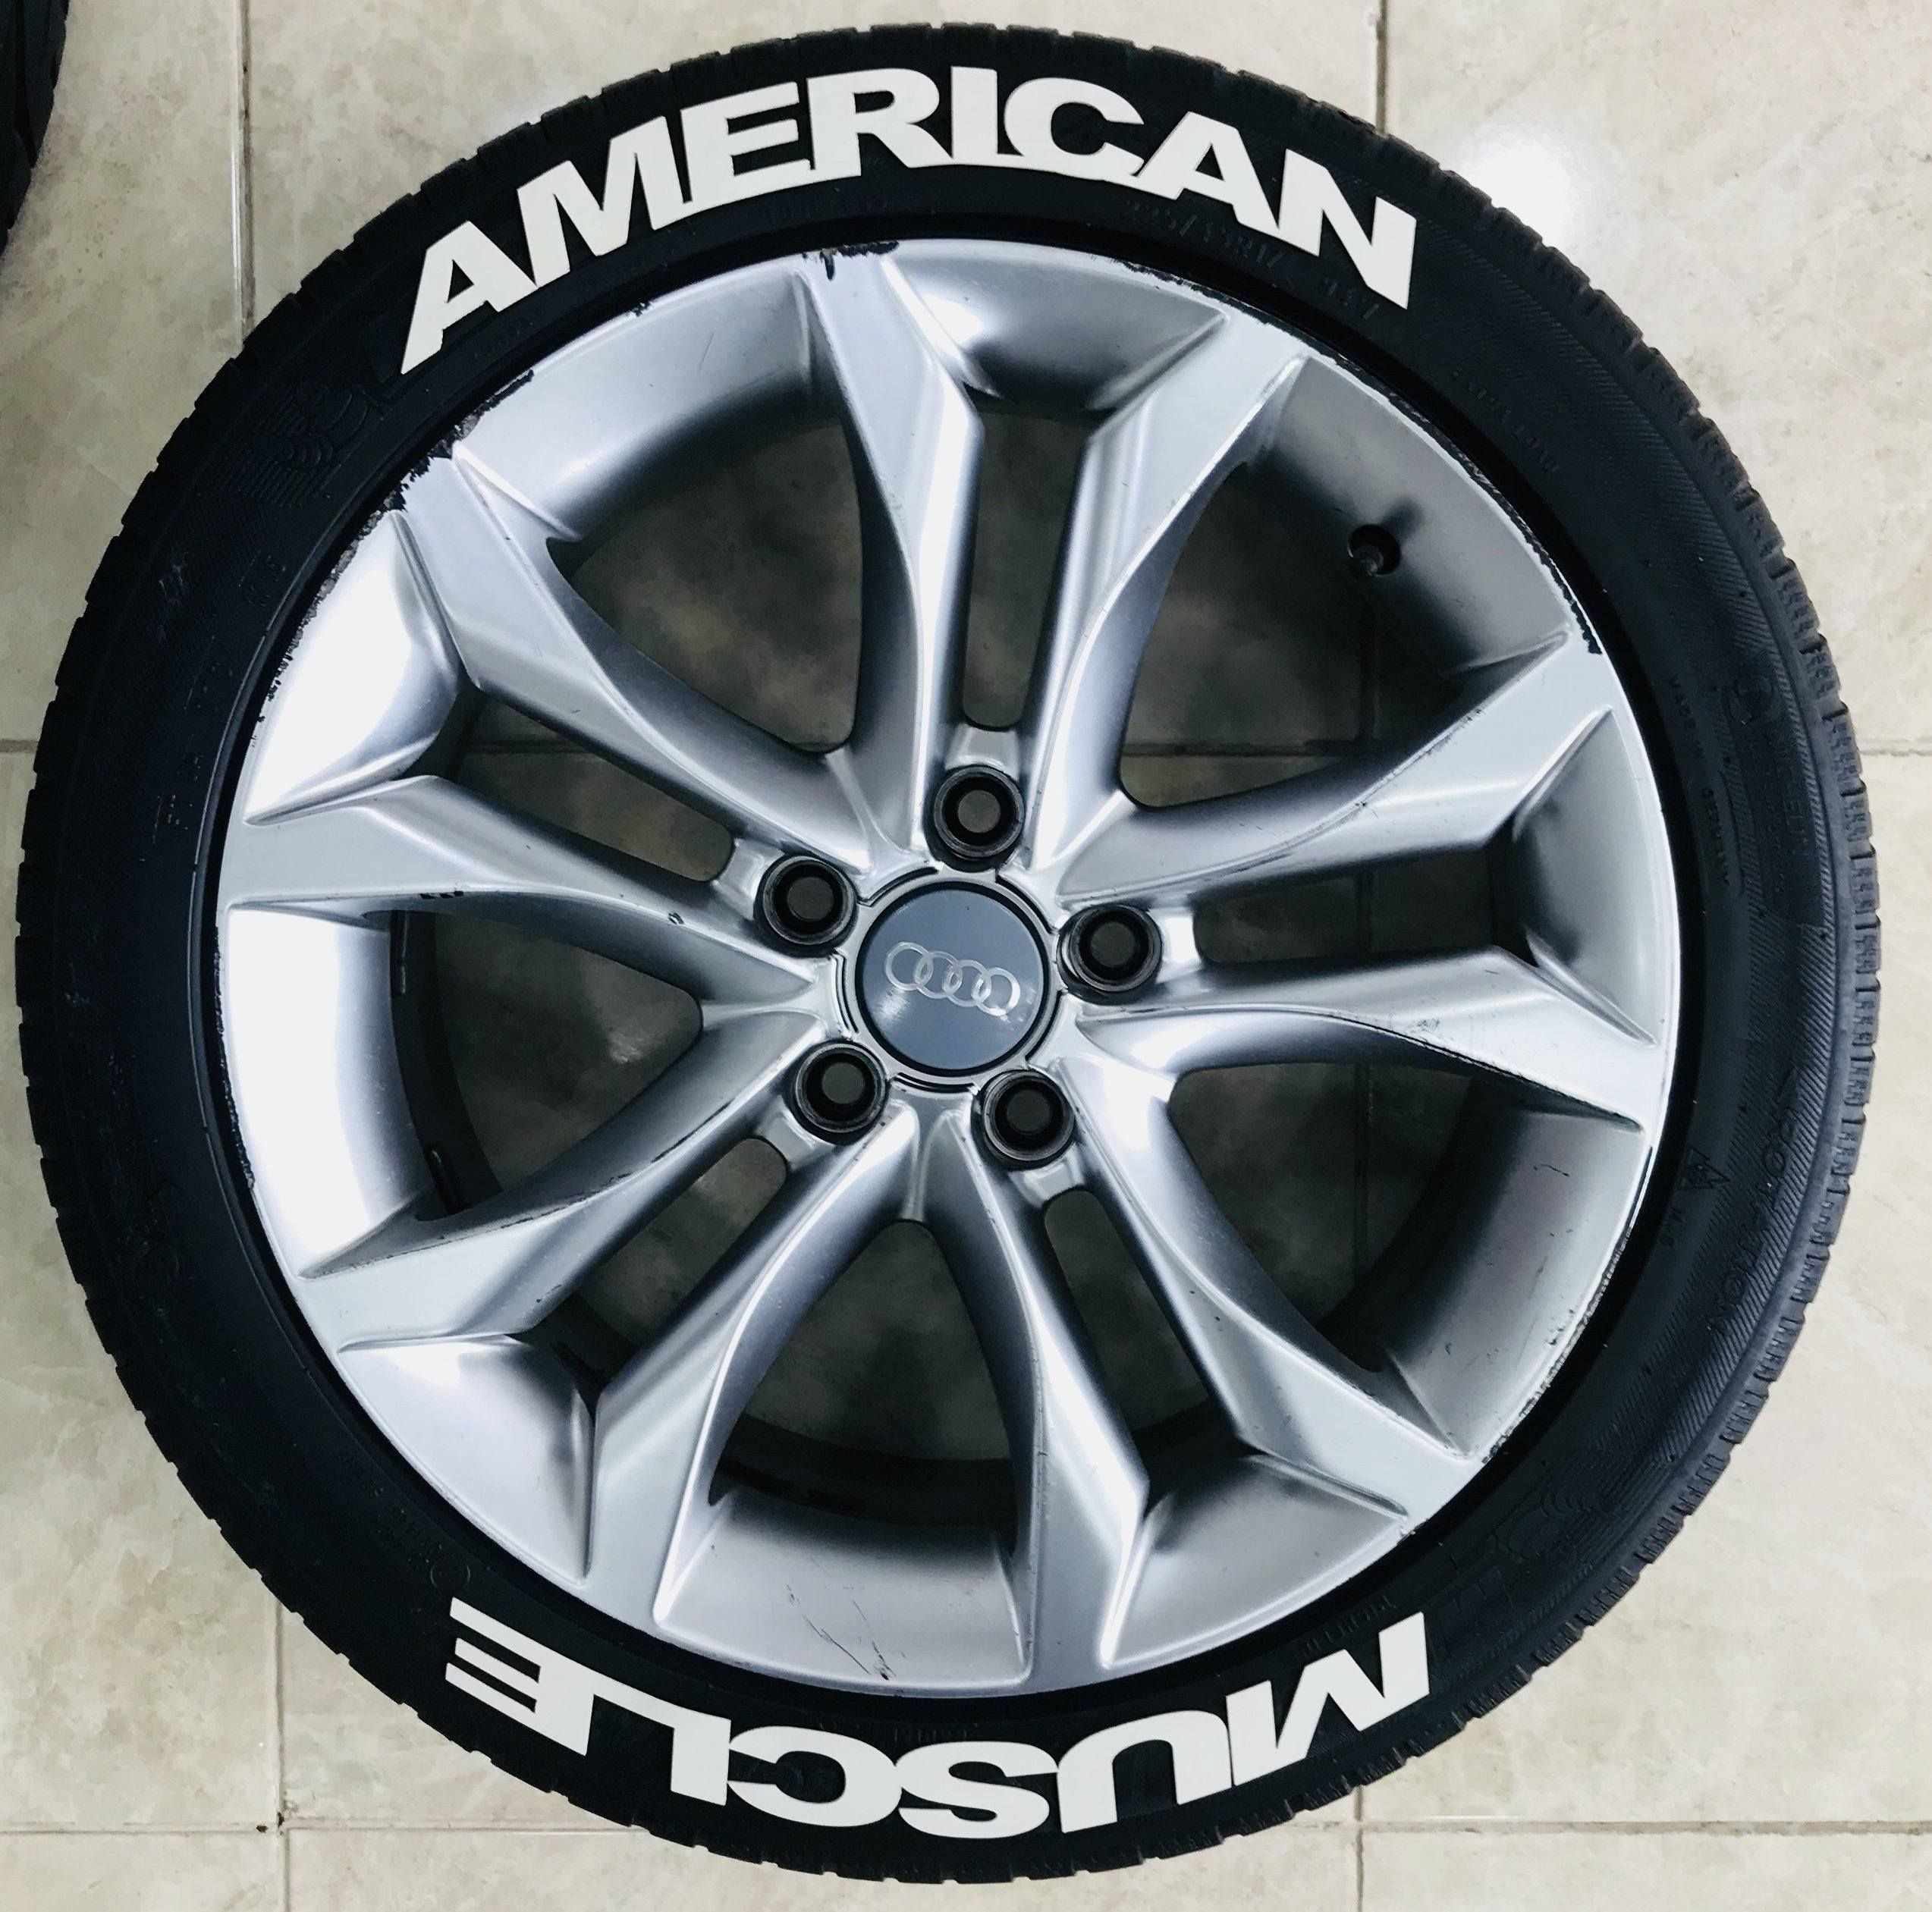 120 american muscle permanent rubber tire letter 16pcs 3d tire sticker kit